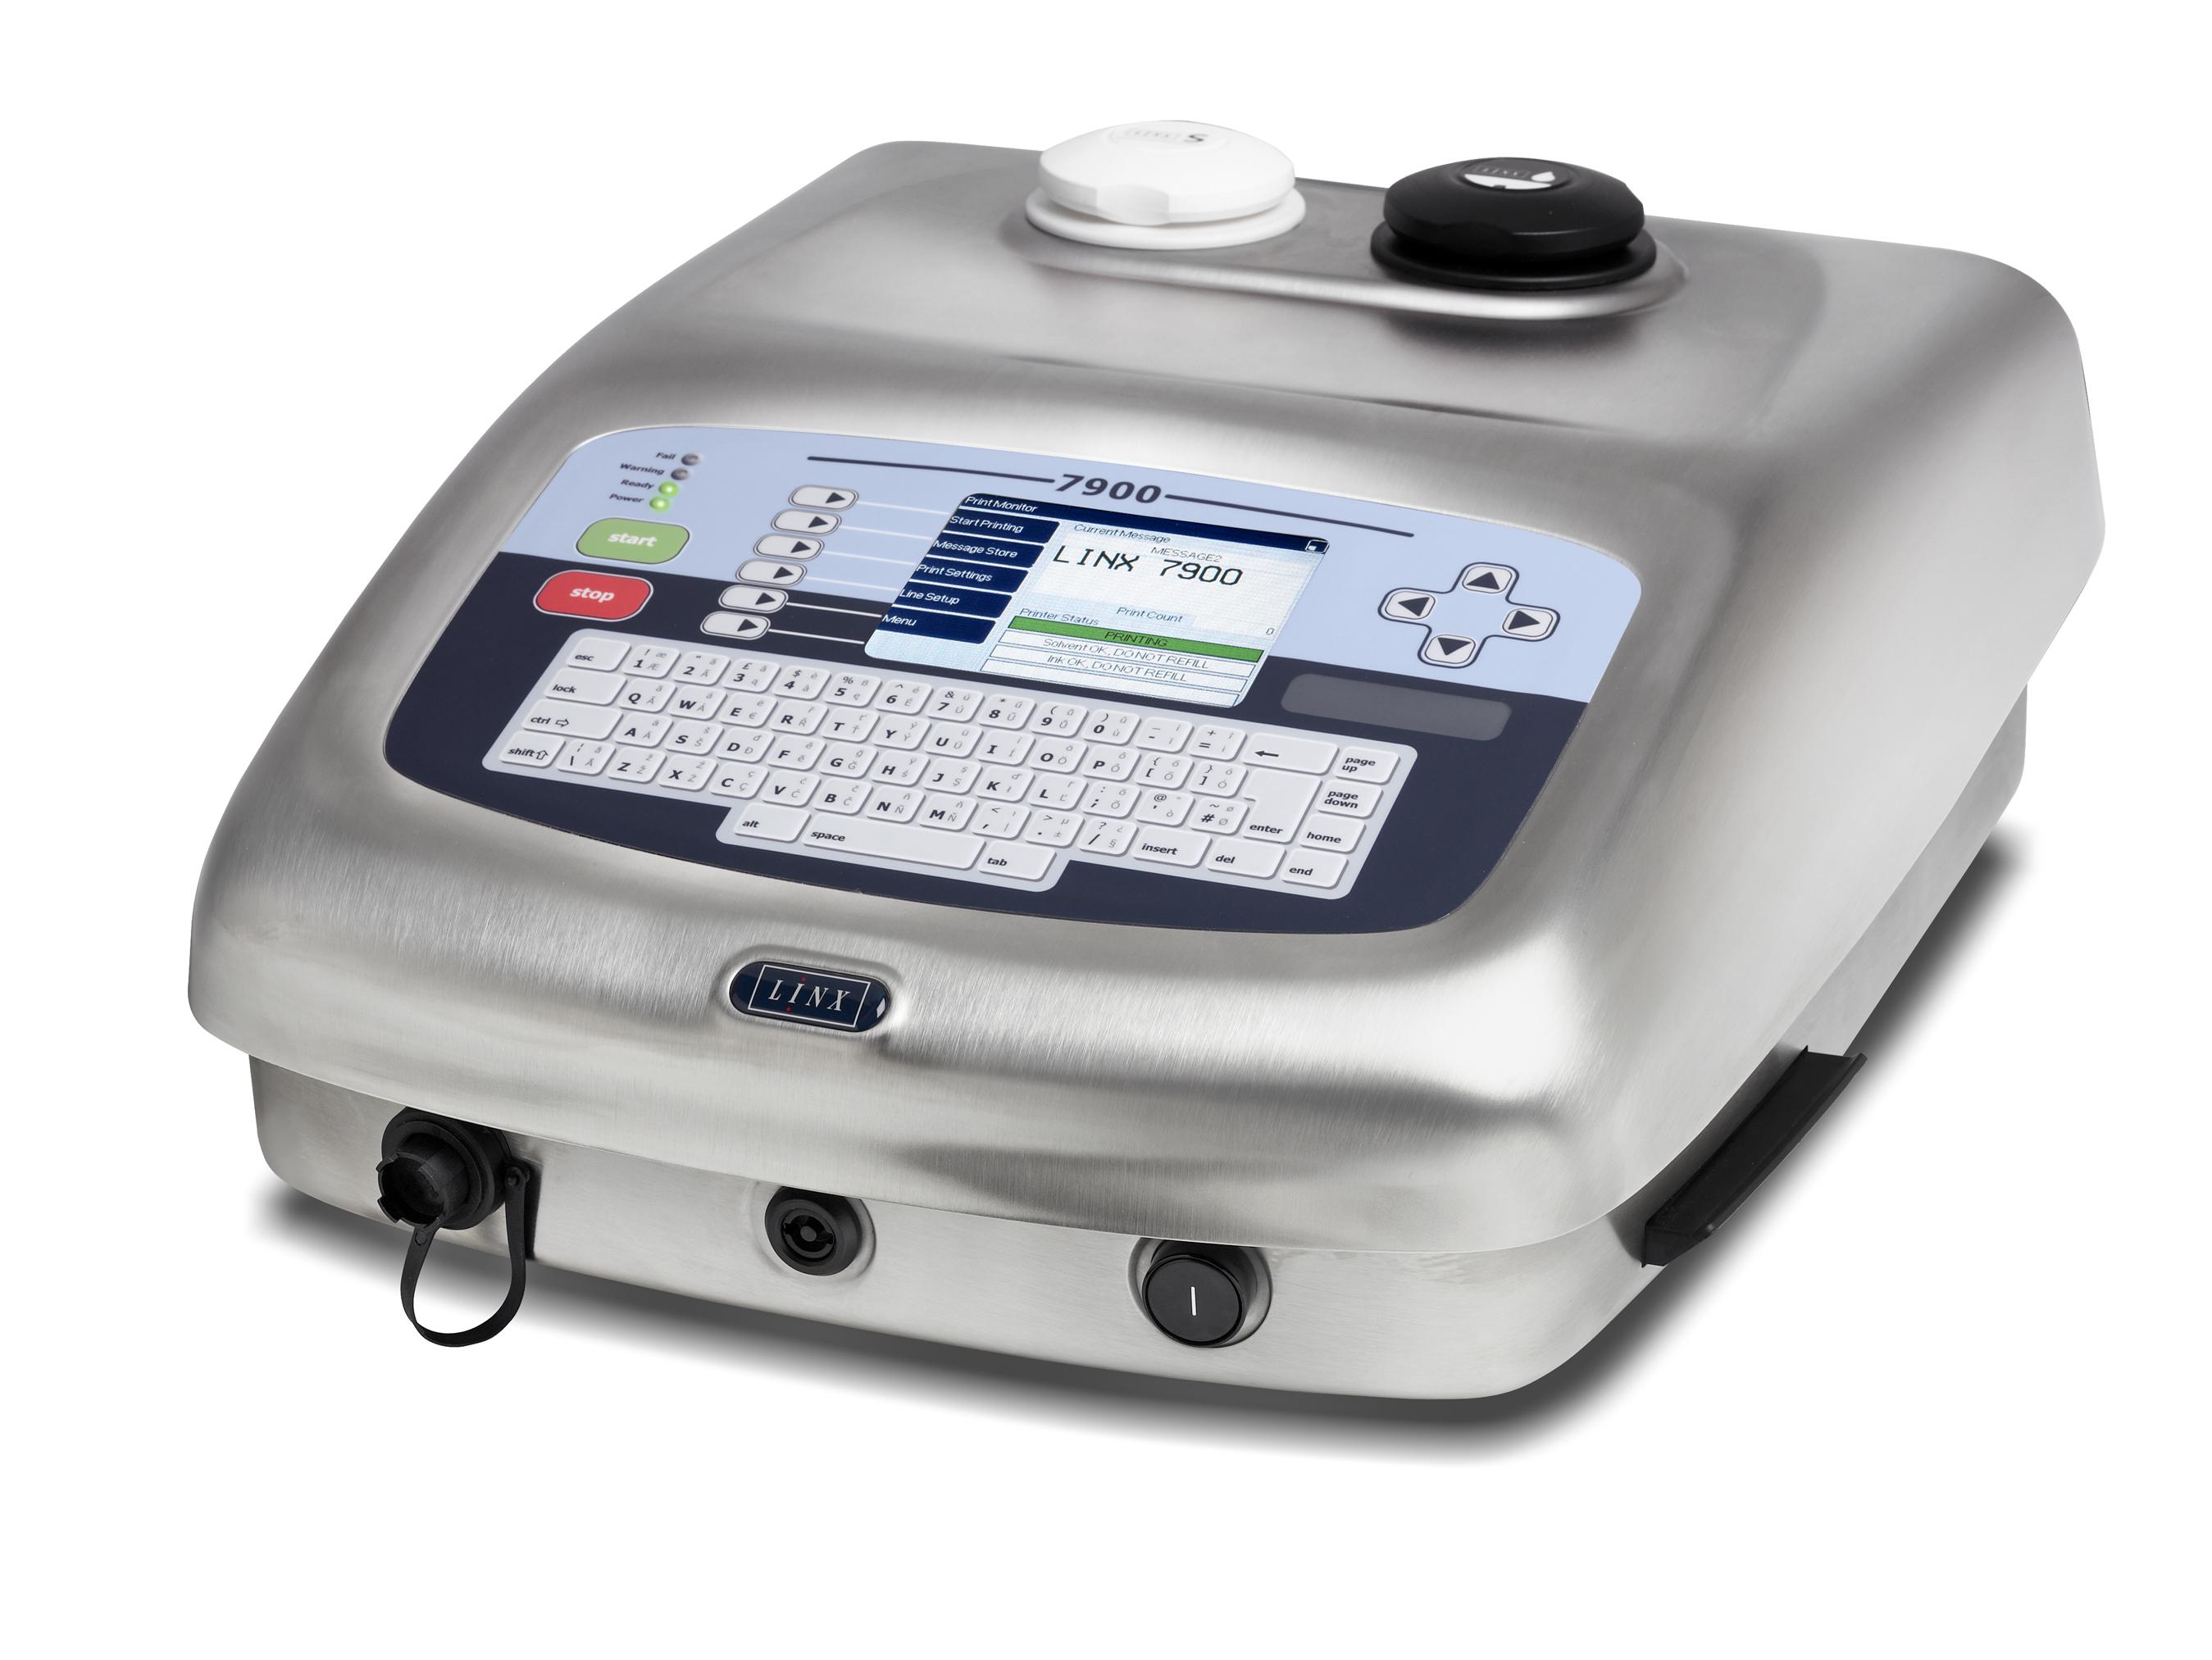 Inkjet printer: LINX7900